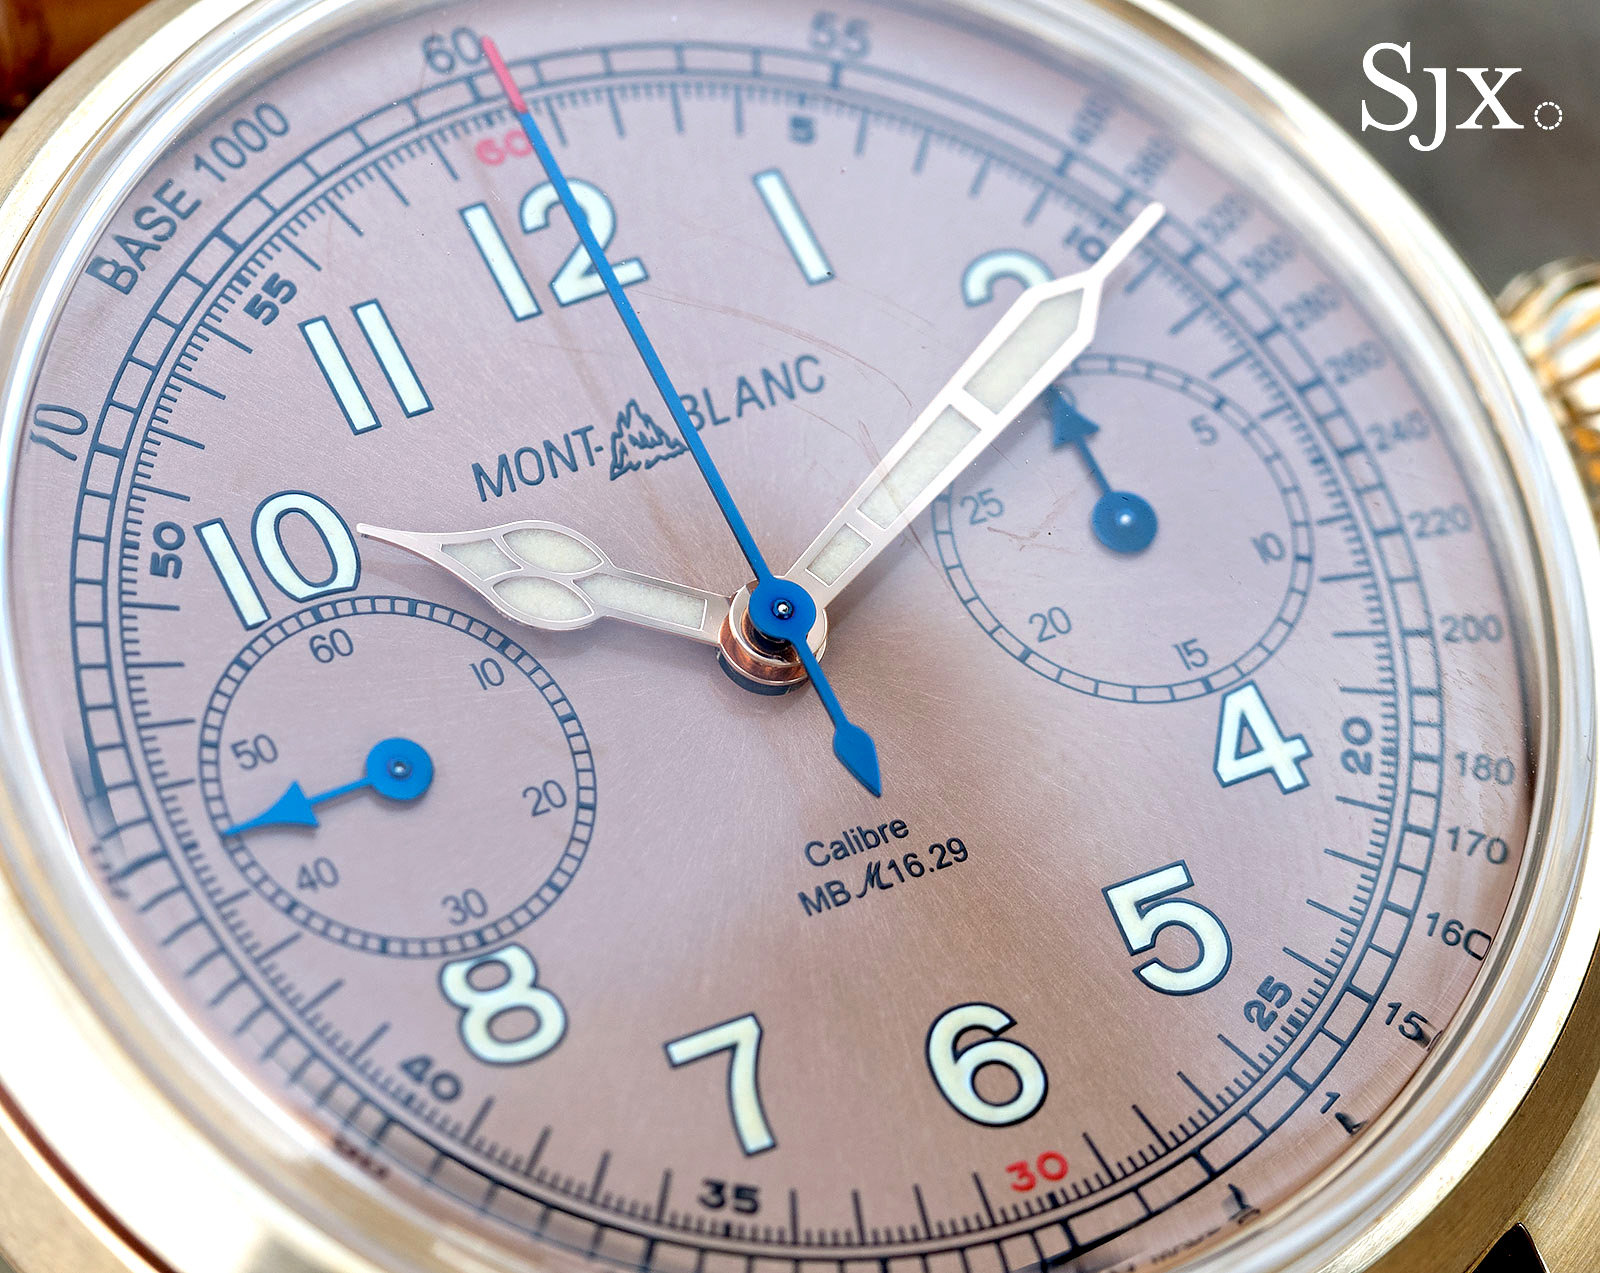 Montblanc 1858 Chronograph Tachymeter Salmon Bronze dial